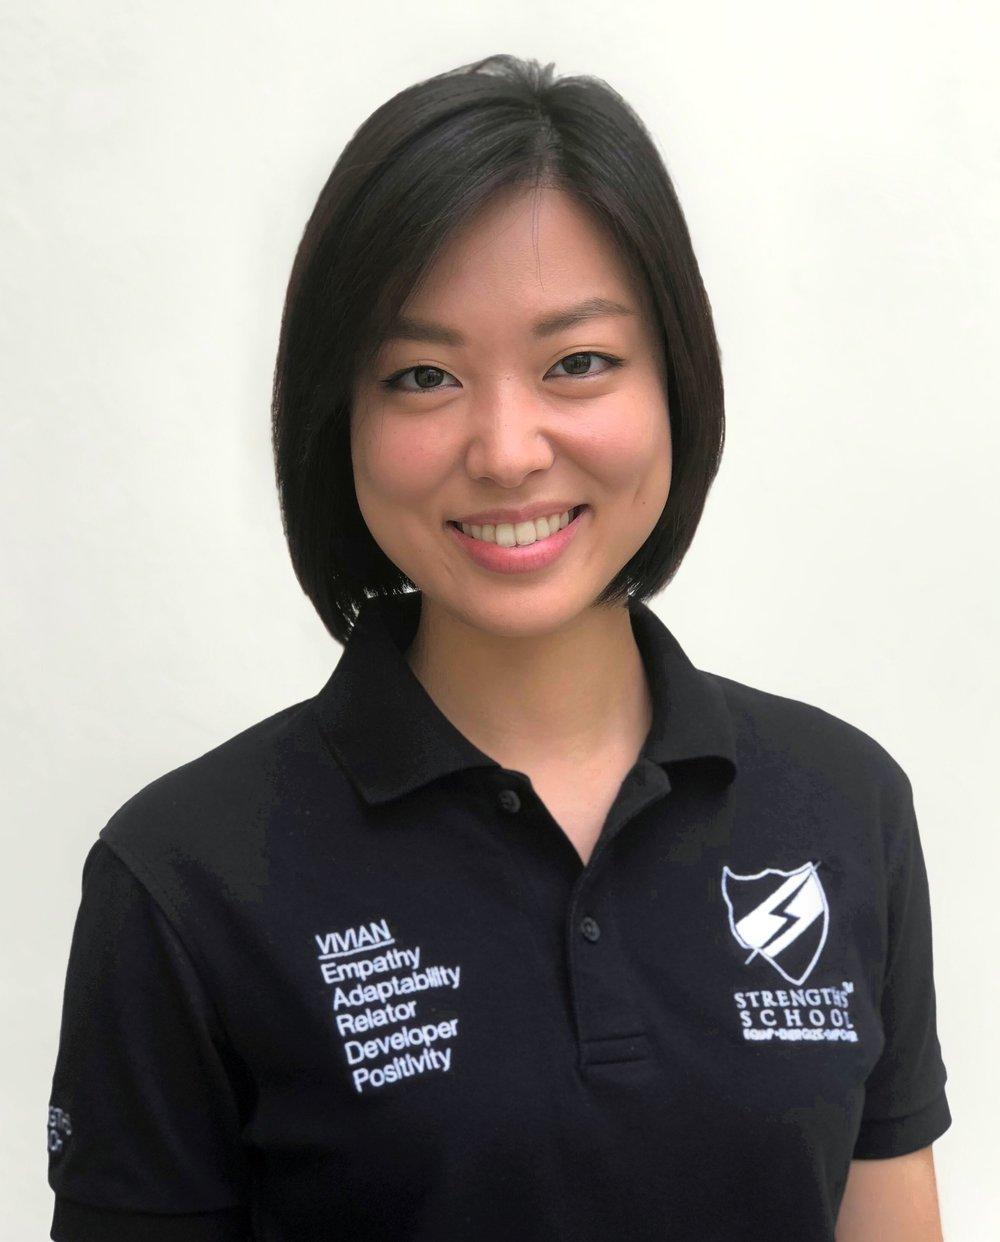 Vivian+Liang+Strengths+School+Singapore+StrengthsFinder.png